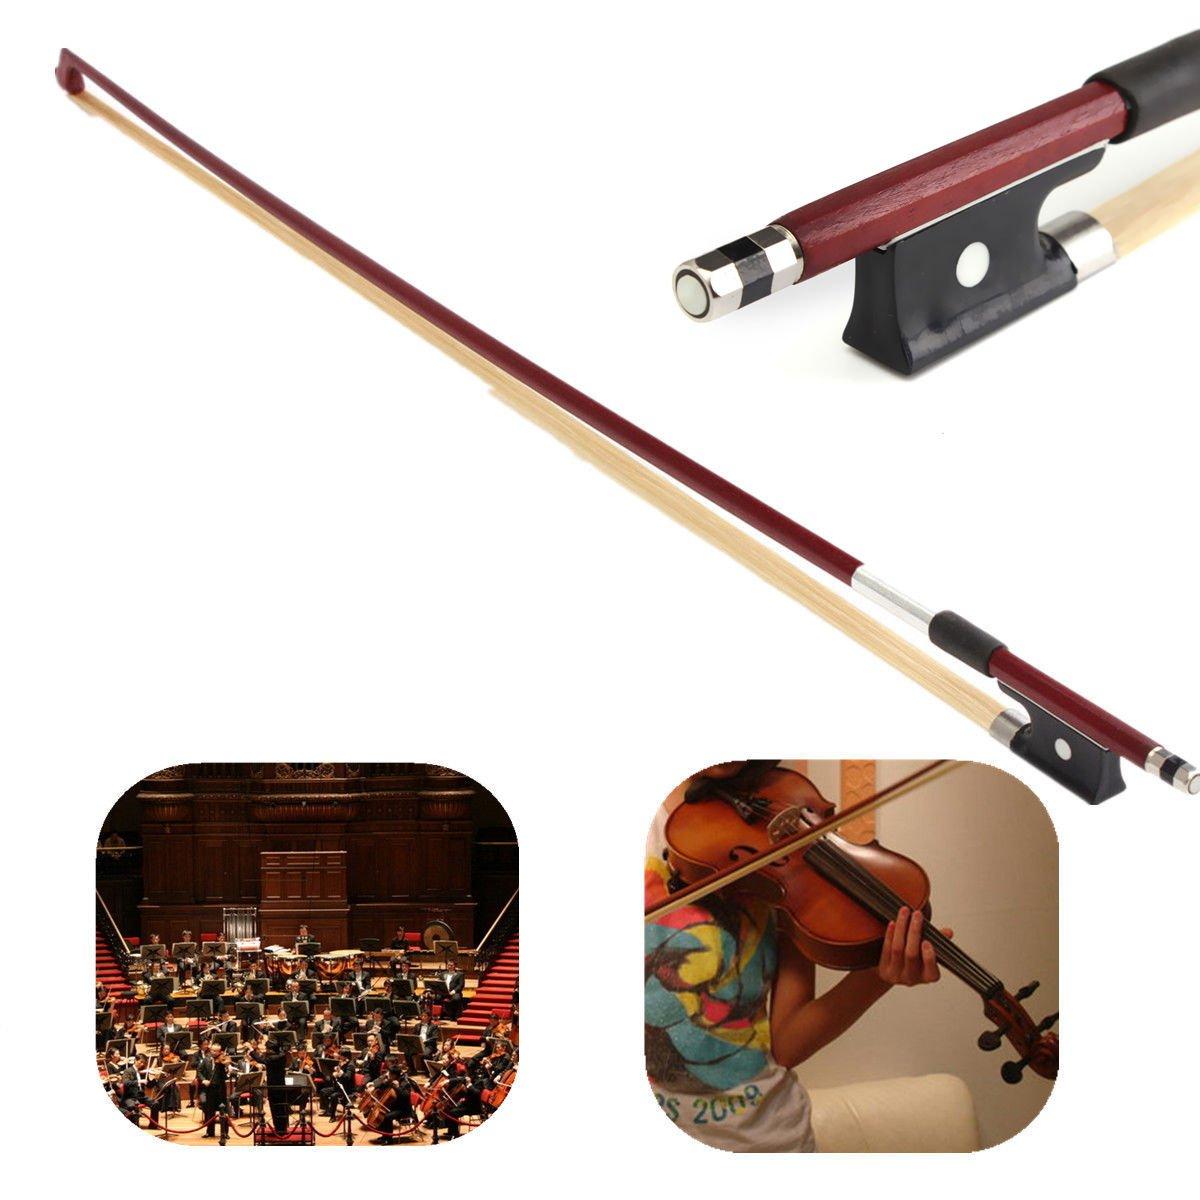 Professional Violin Bow Well Balanced Brazil Wood Ebony Frog Violin Arbor Horsehair Bow 4/4 / 3/4 / 1/2 1/4 /1/8 (1/2) Unihoom 1/2 violin bow